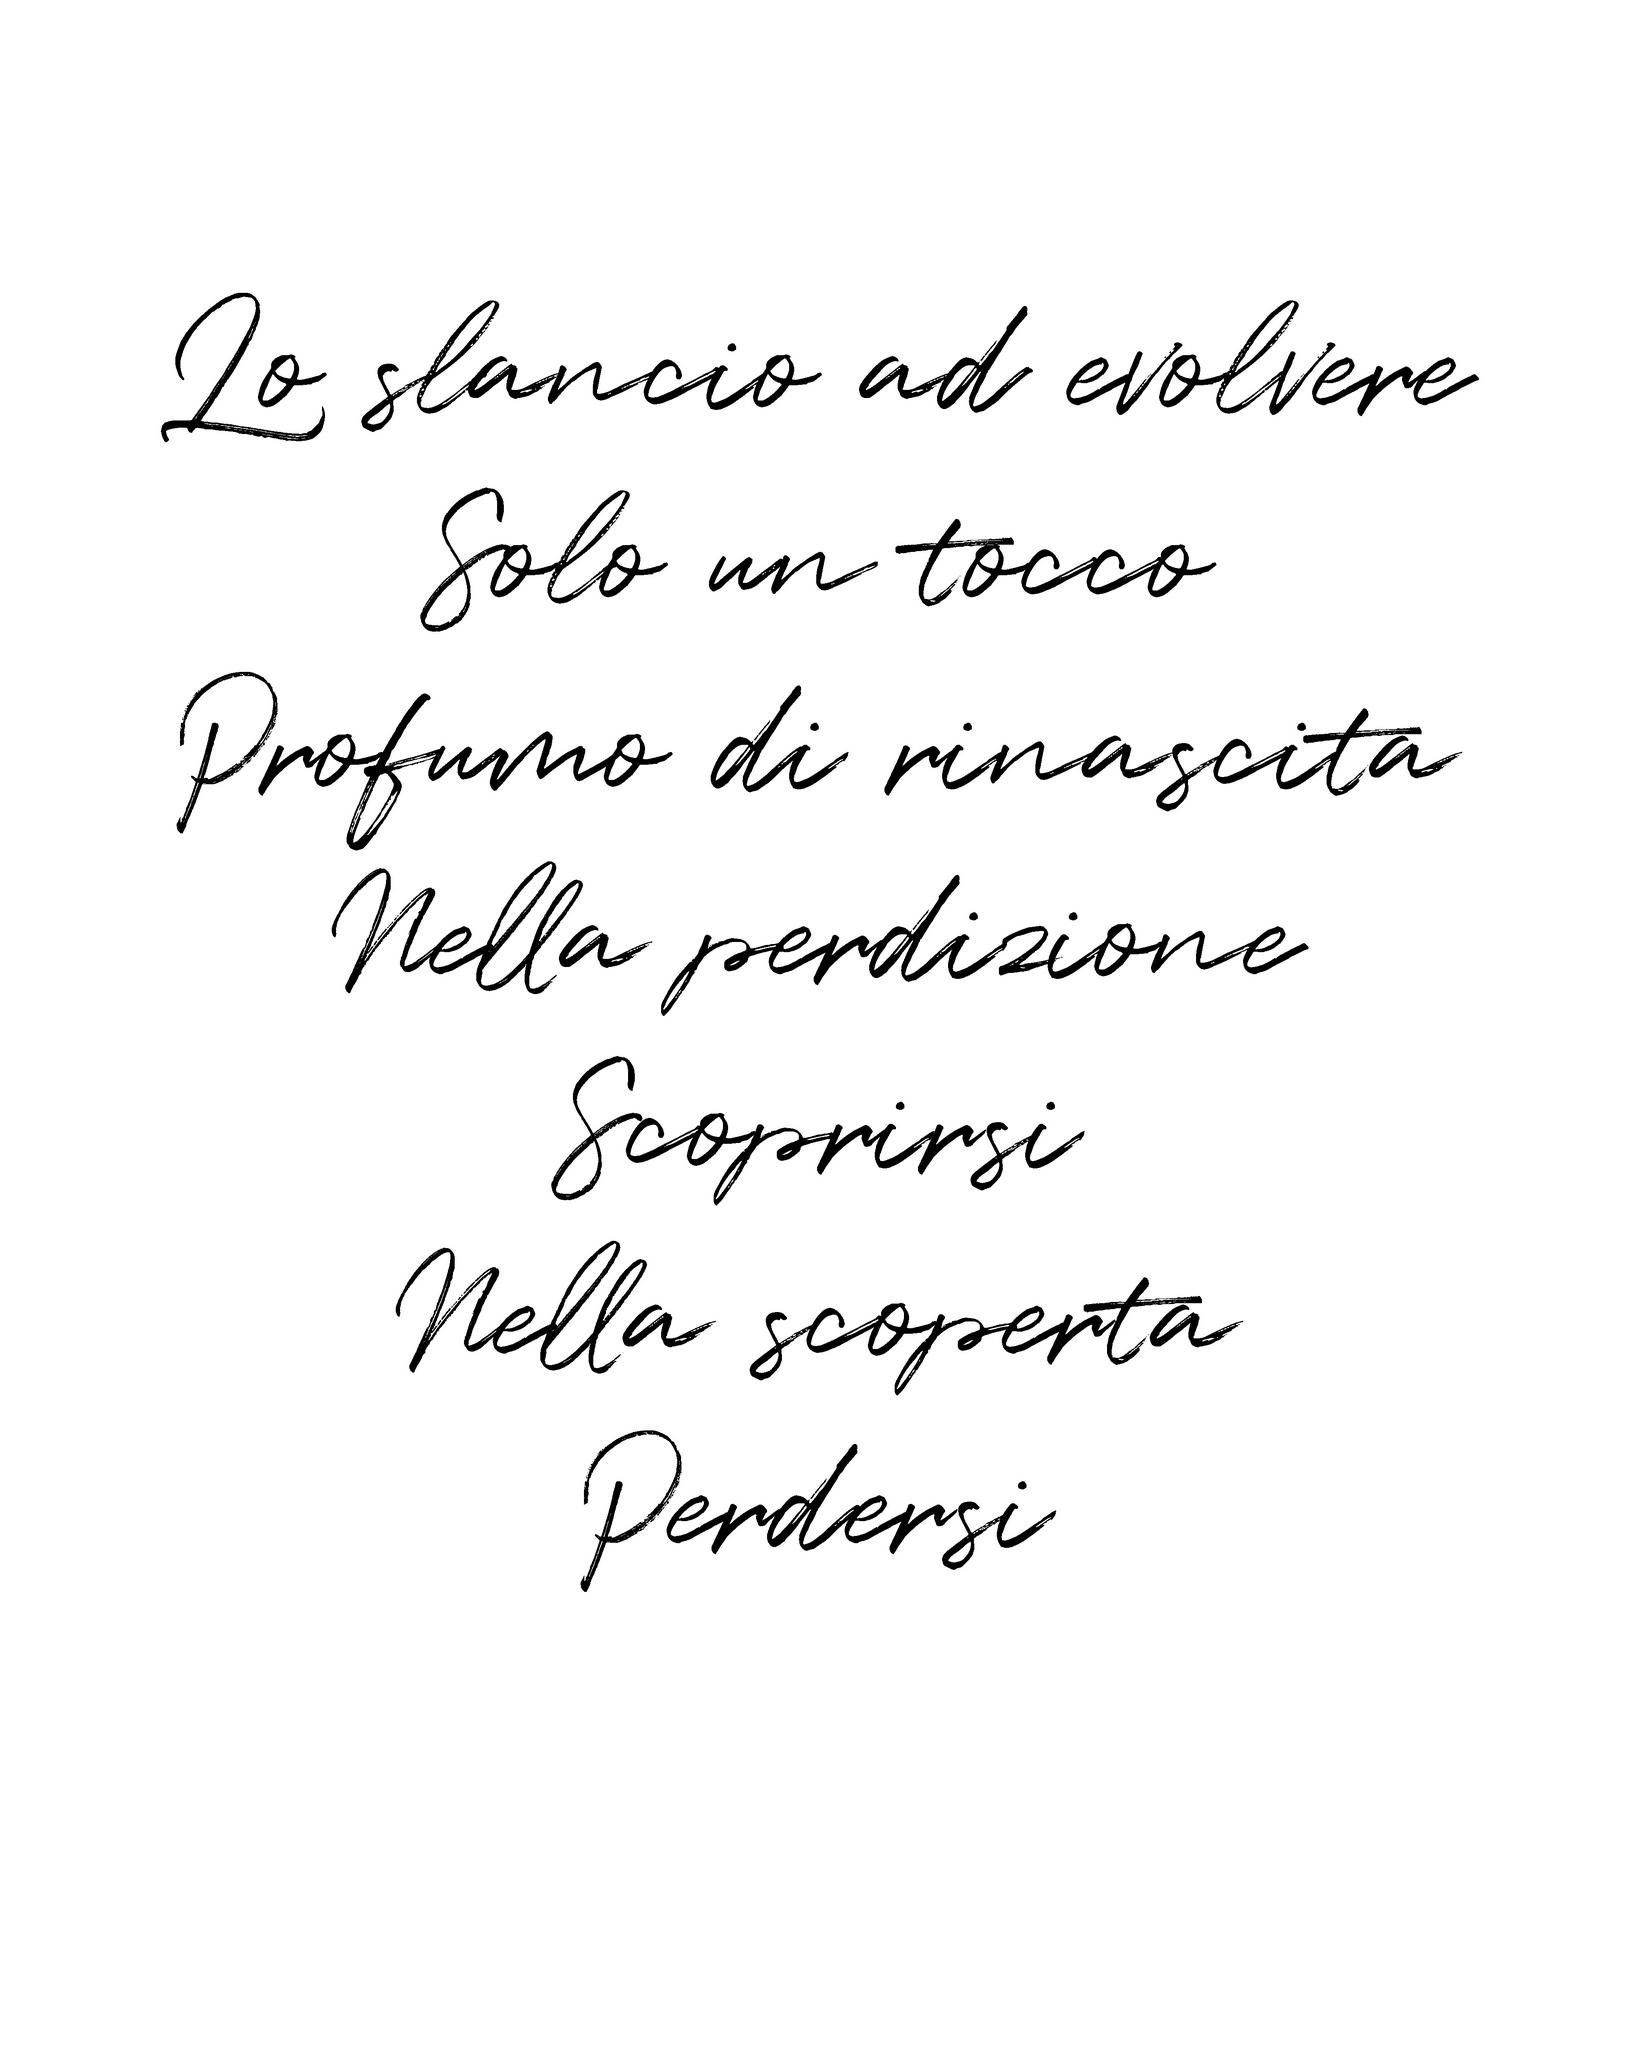 Categorie: Fine Art, Glamour, Portrait - Photographer: FRANCESCO SCALZO - Model: MARY CATANIA - Location: Cosenza, CS, Italia